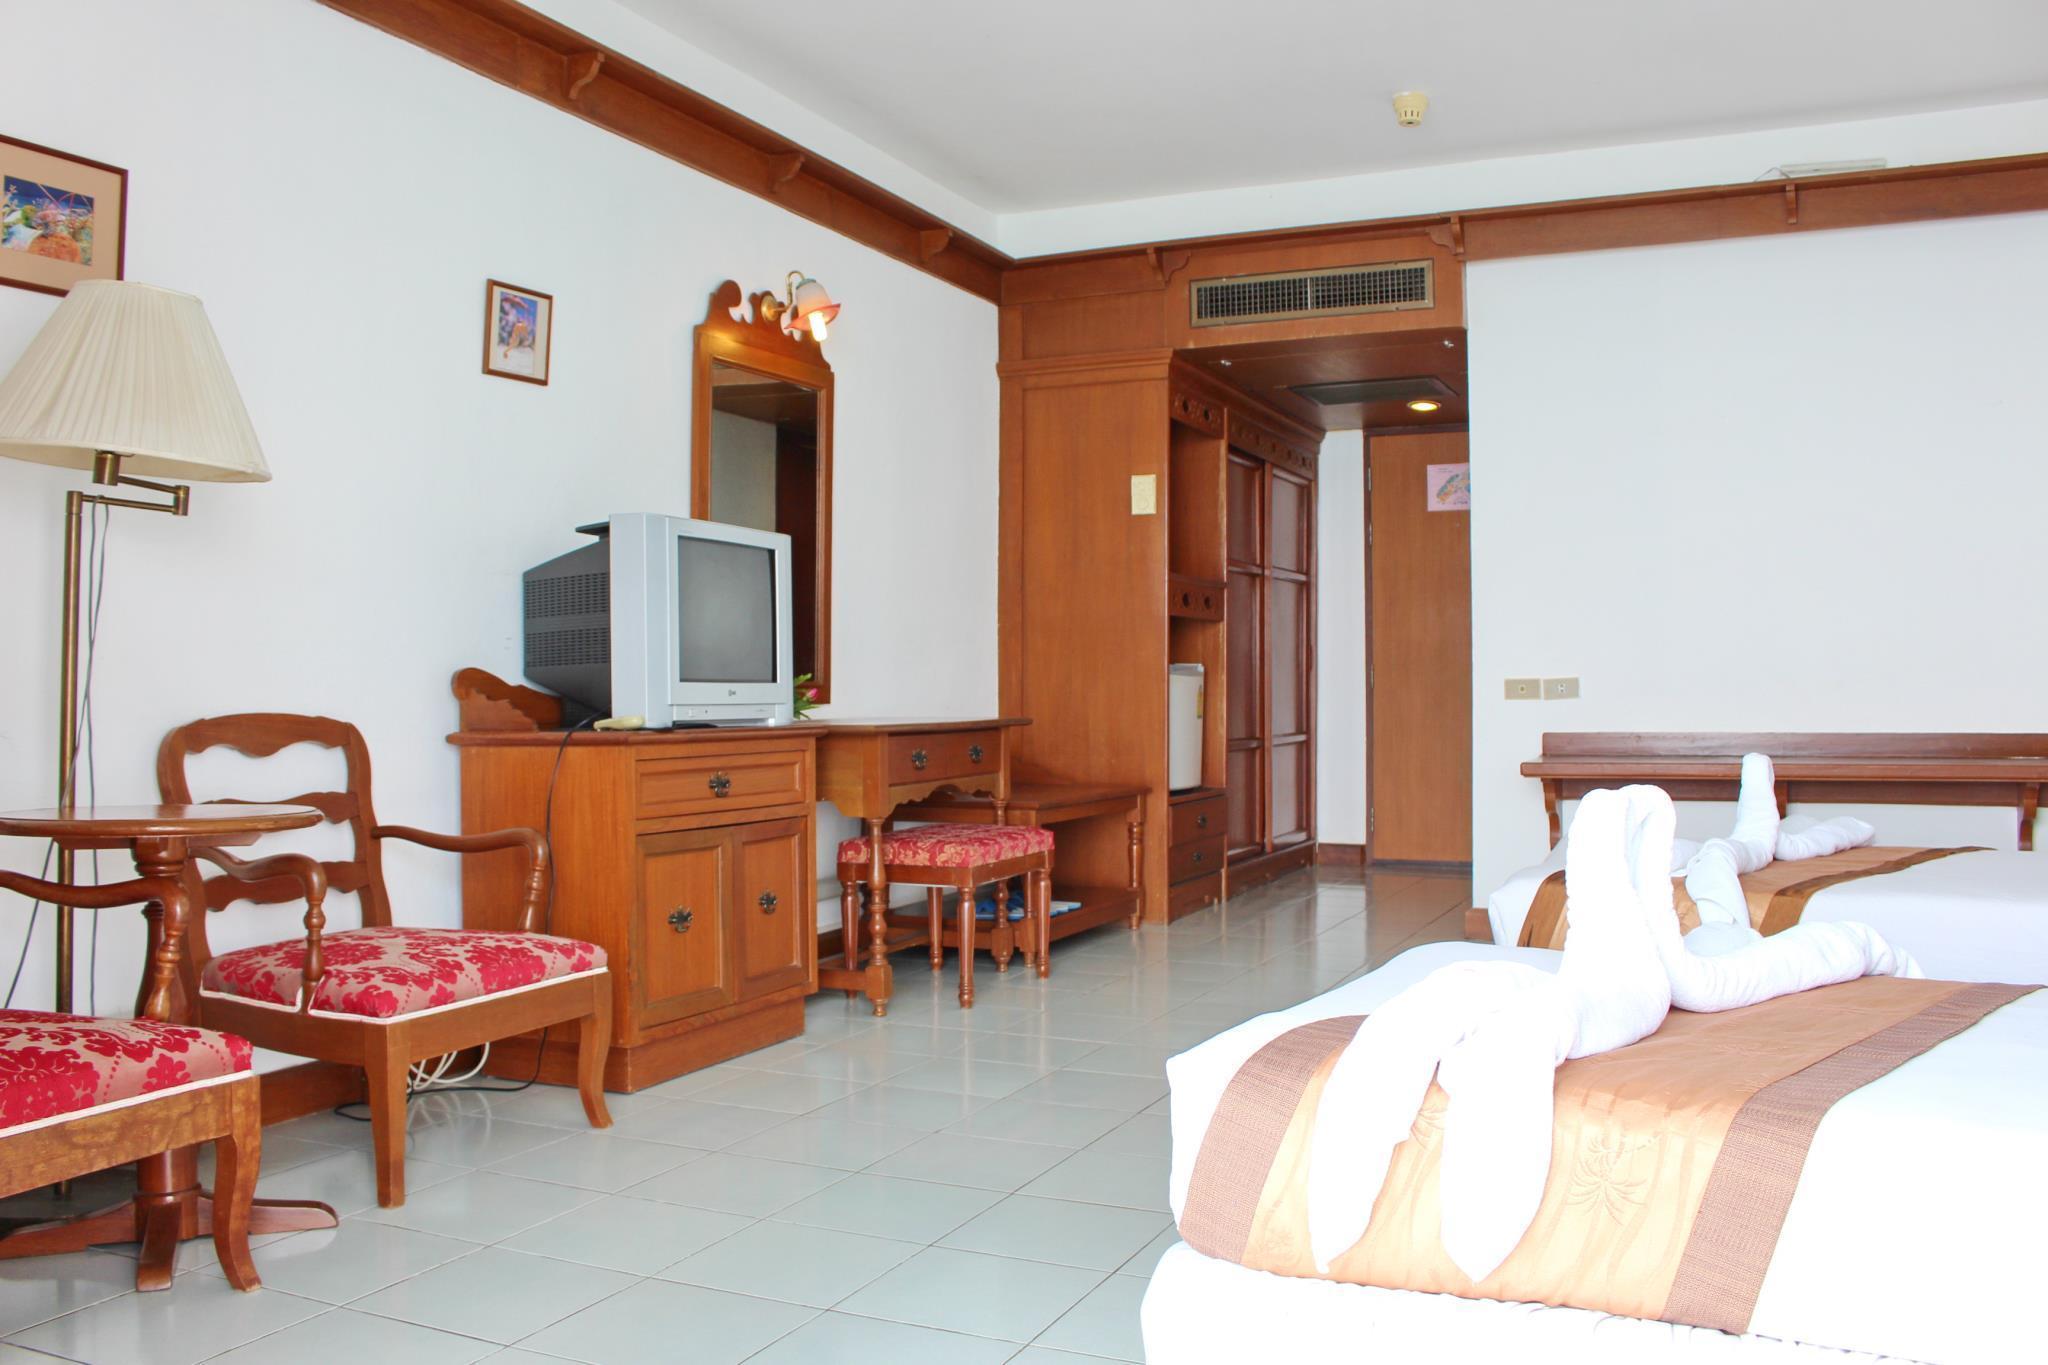 Hinsuay Namsai Resort,หินสวยน้ำใส รีสอร์ท